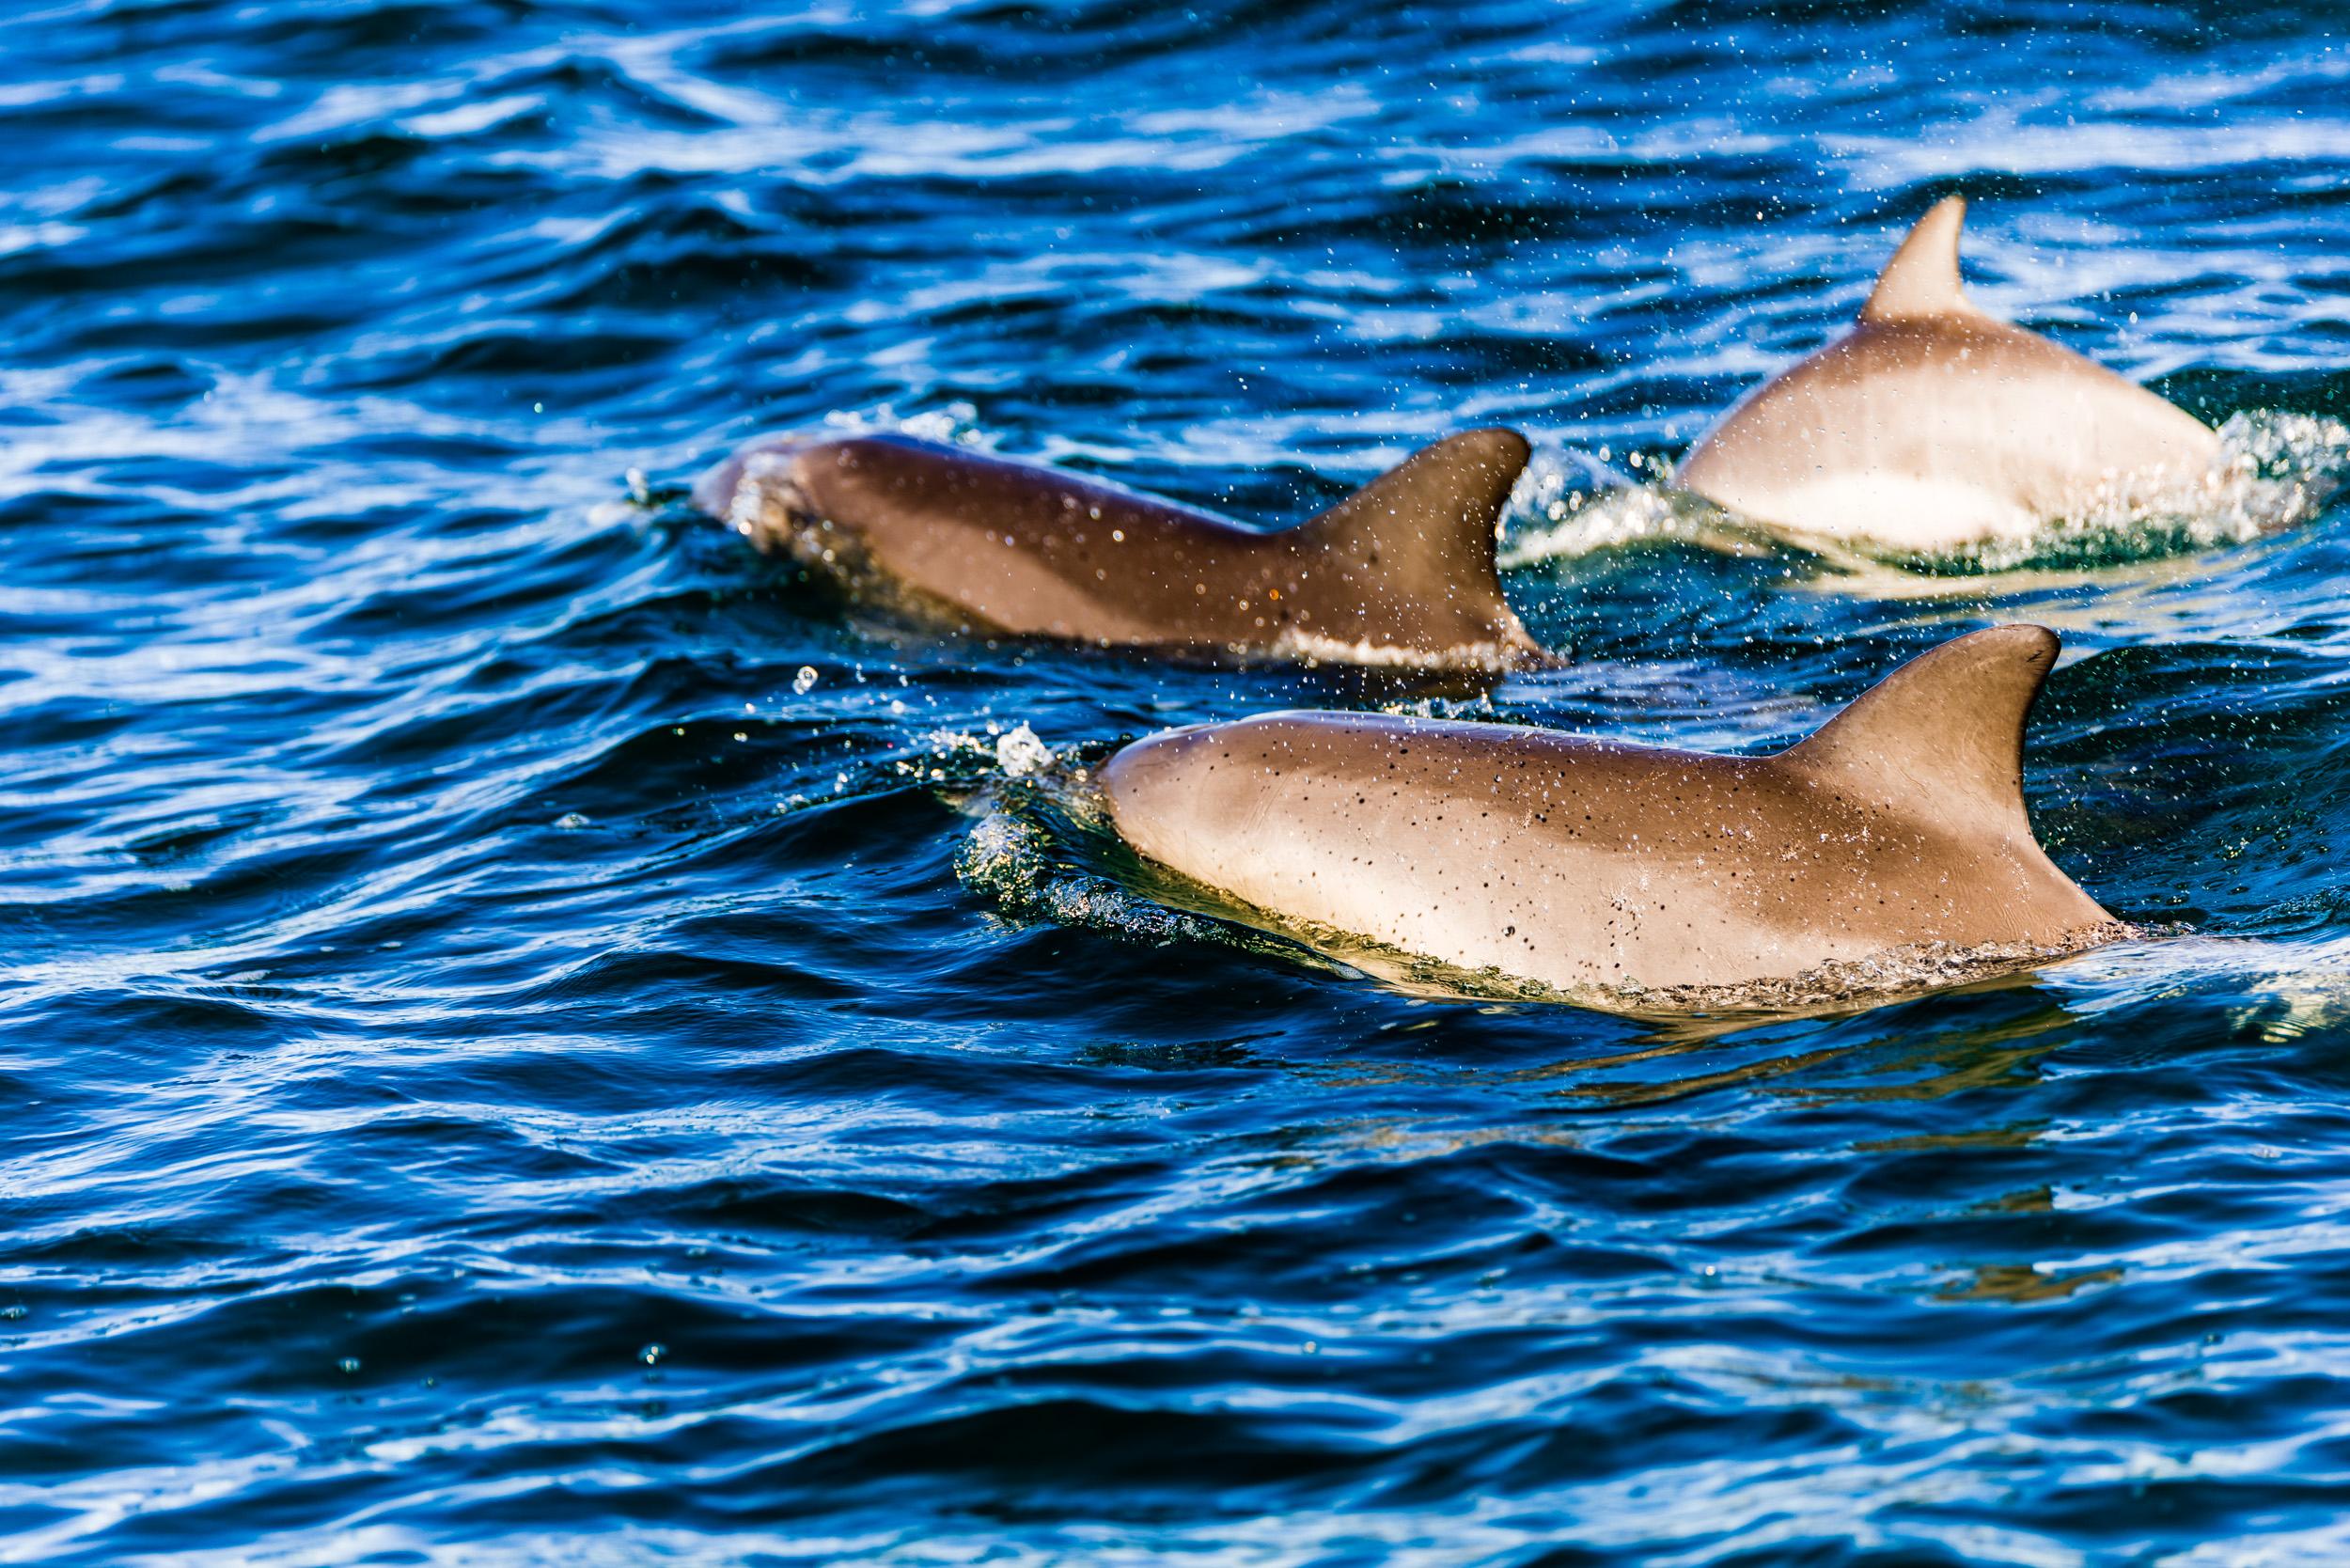 Spyrides_Kyle_Dolphin_Swimming_Rockingham_DSC2699.jpg